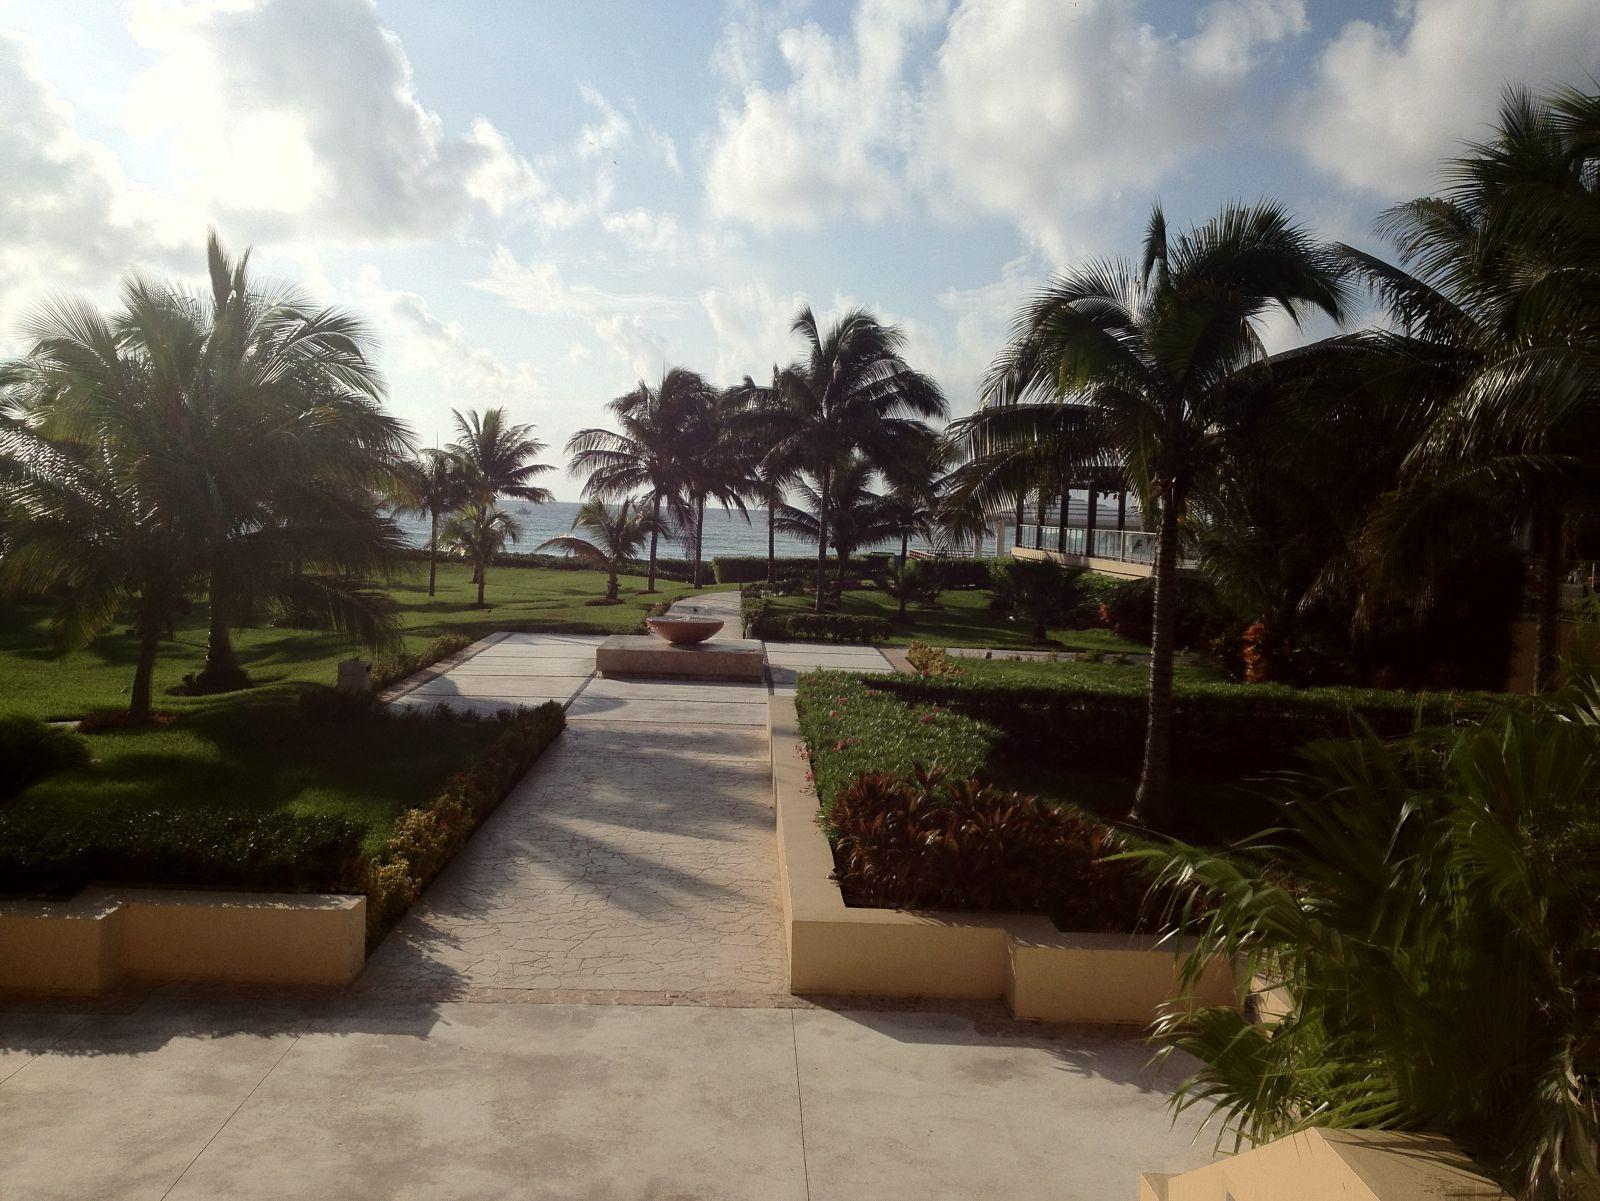 Goodmorning Riviera Maya!